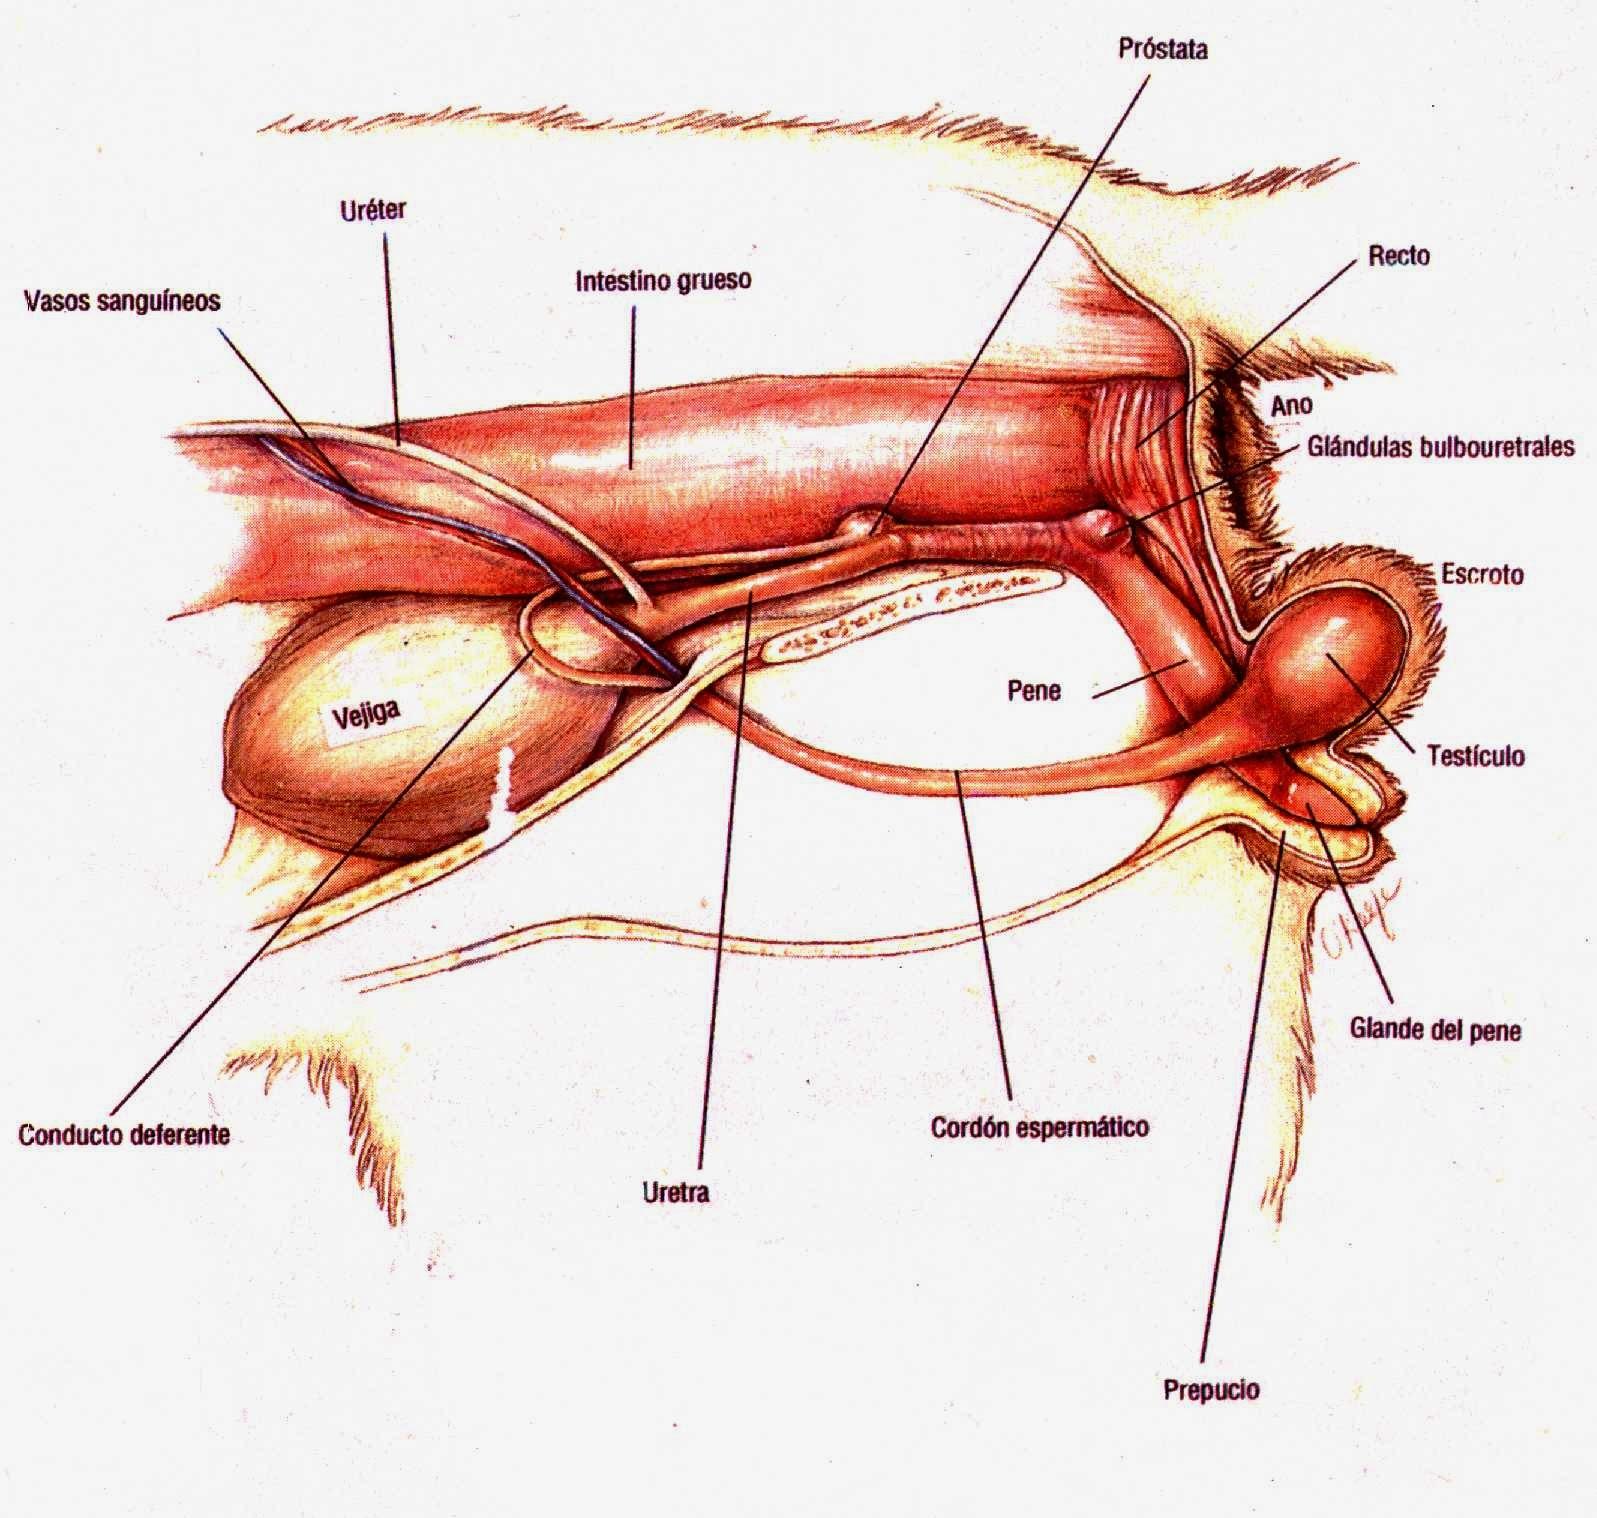 sistema reproductor del perro